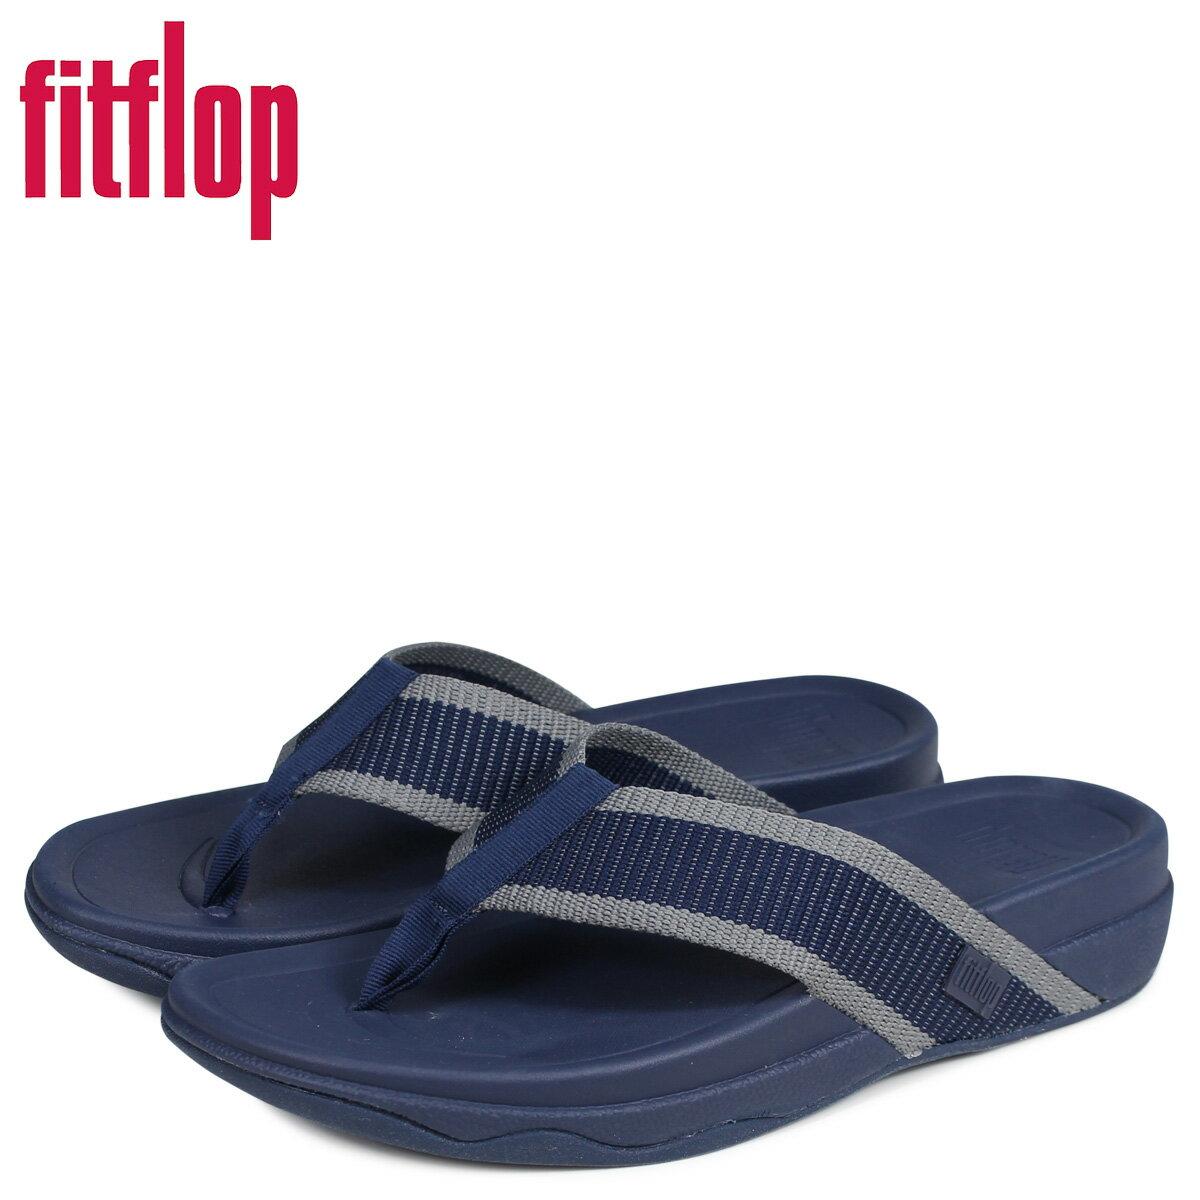 FitFlop フィットフロップ サンダル トングサンダル サーファー メンズ SURFER ネイビー J41 [3/20 新入荷]